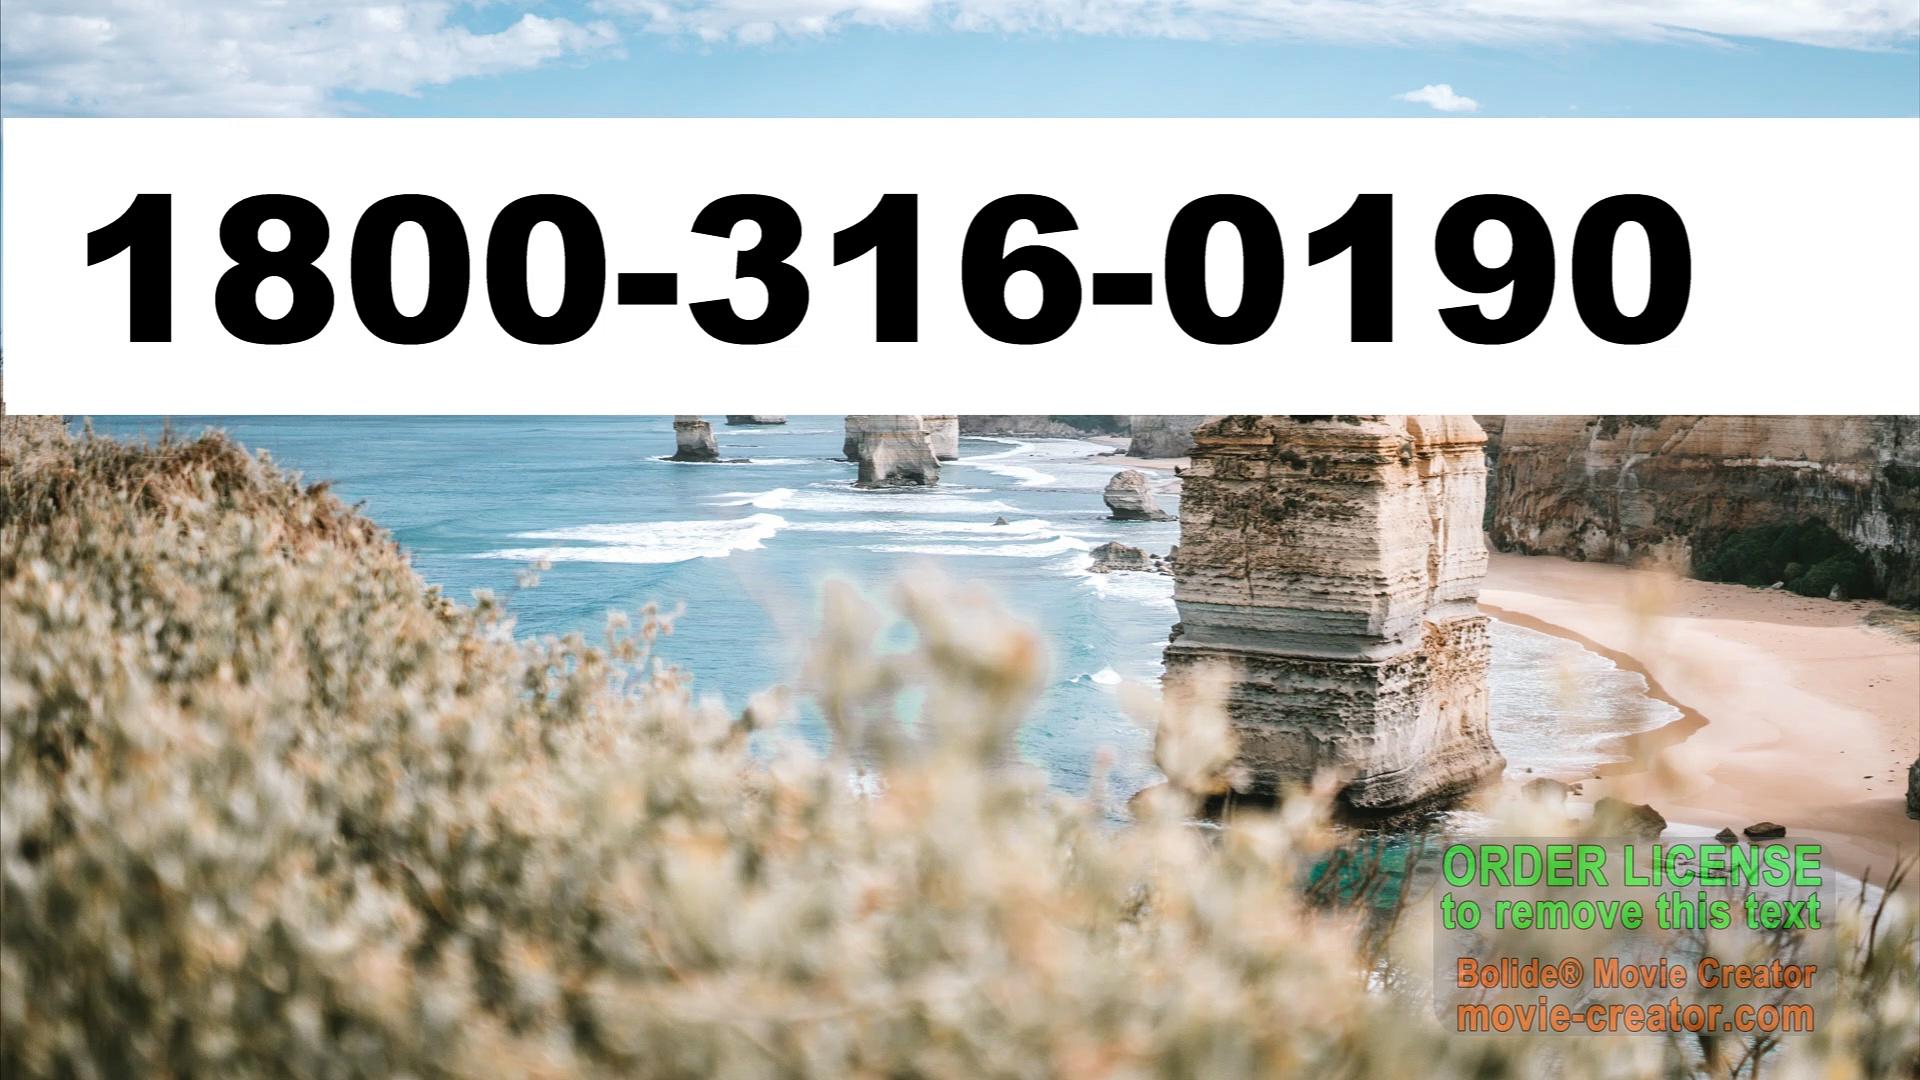 Roadrunner tech Support Number ☎+1-(800)-316-0190 Roadrunner tech Support Phone Number